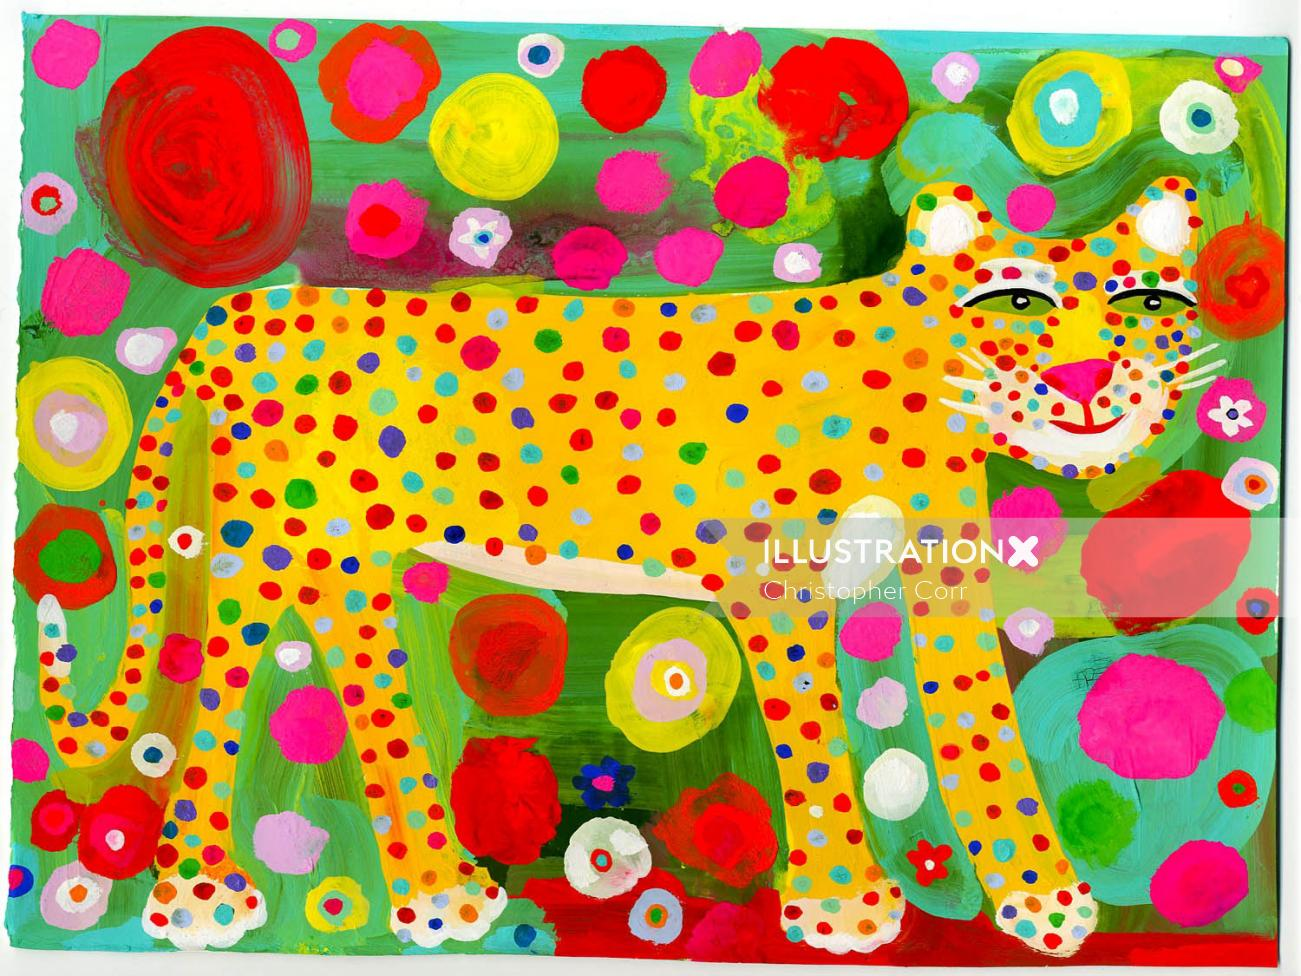 leopard illustration for children's book illustration by Christopher Corr